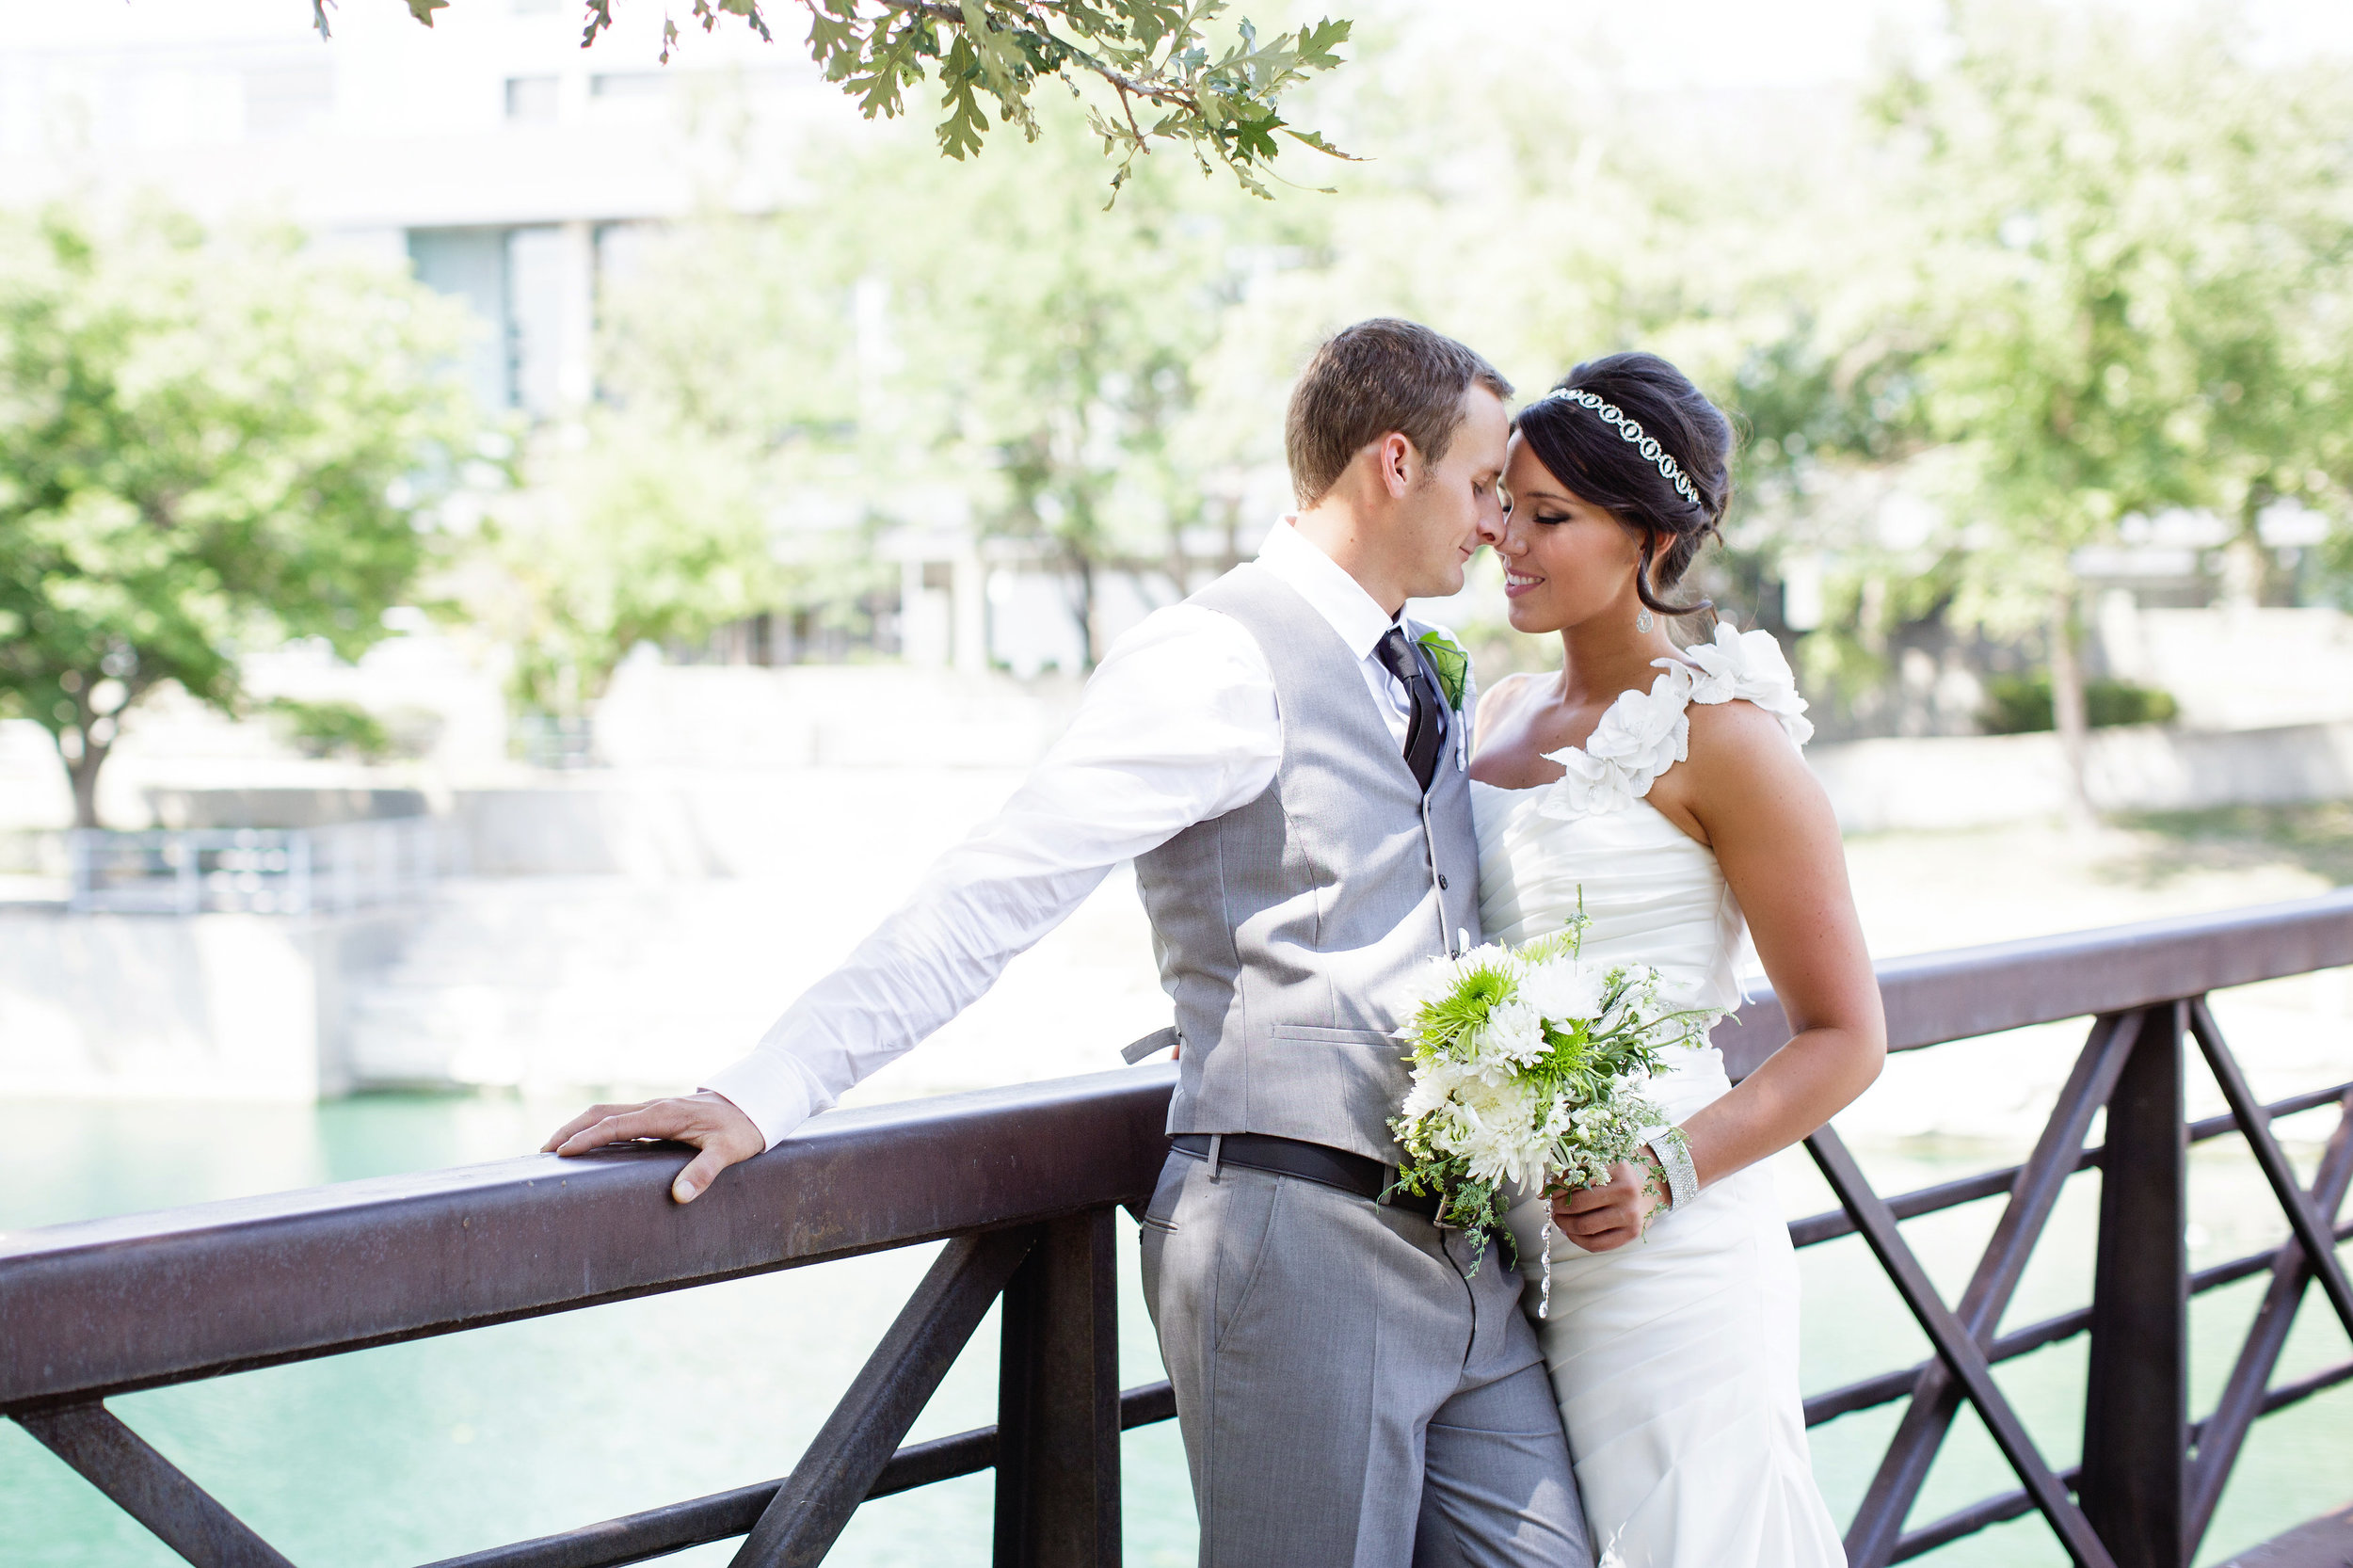 omaha-venue-the-living-room-white-black-downtown-wedding-gray-suit-bridge-bridal-portrait